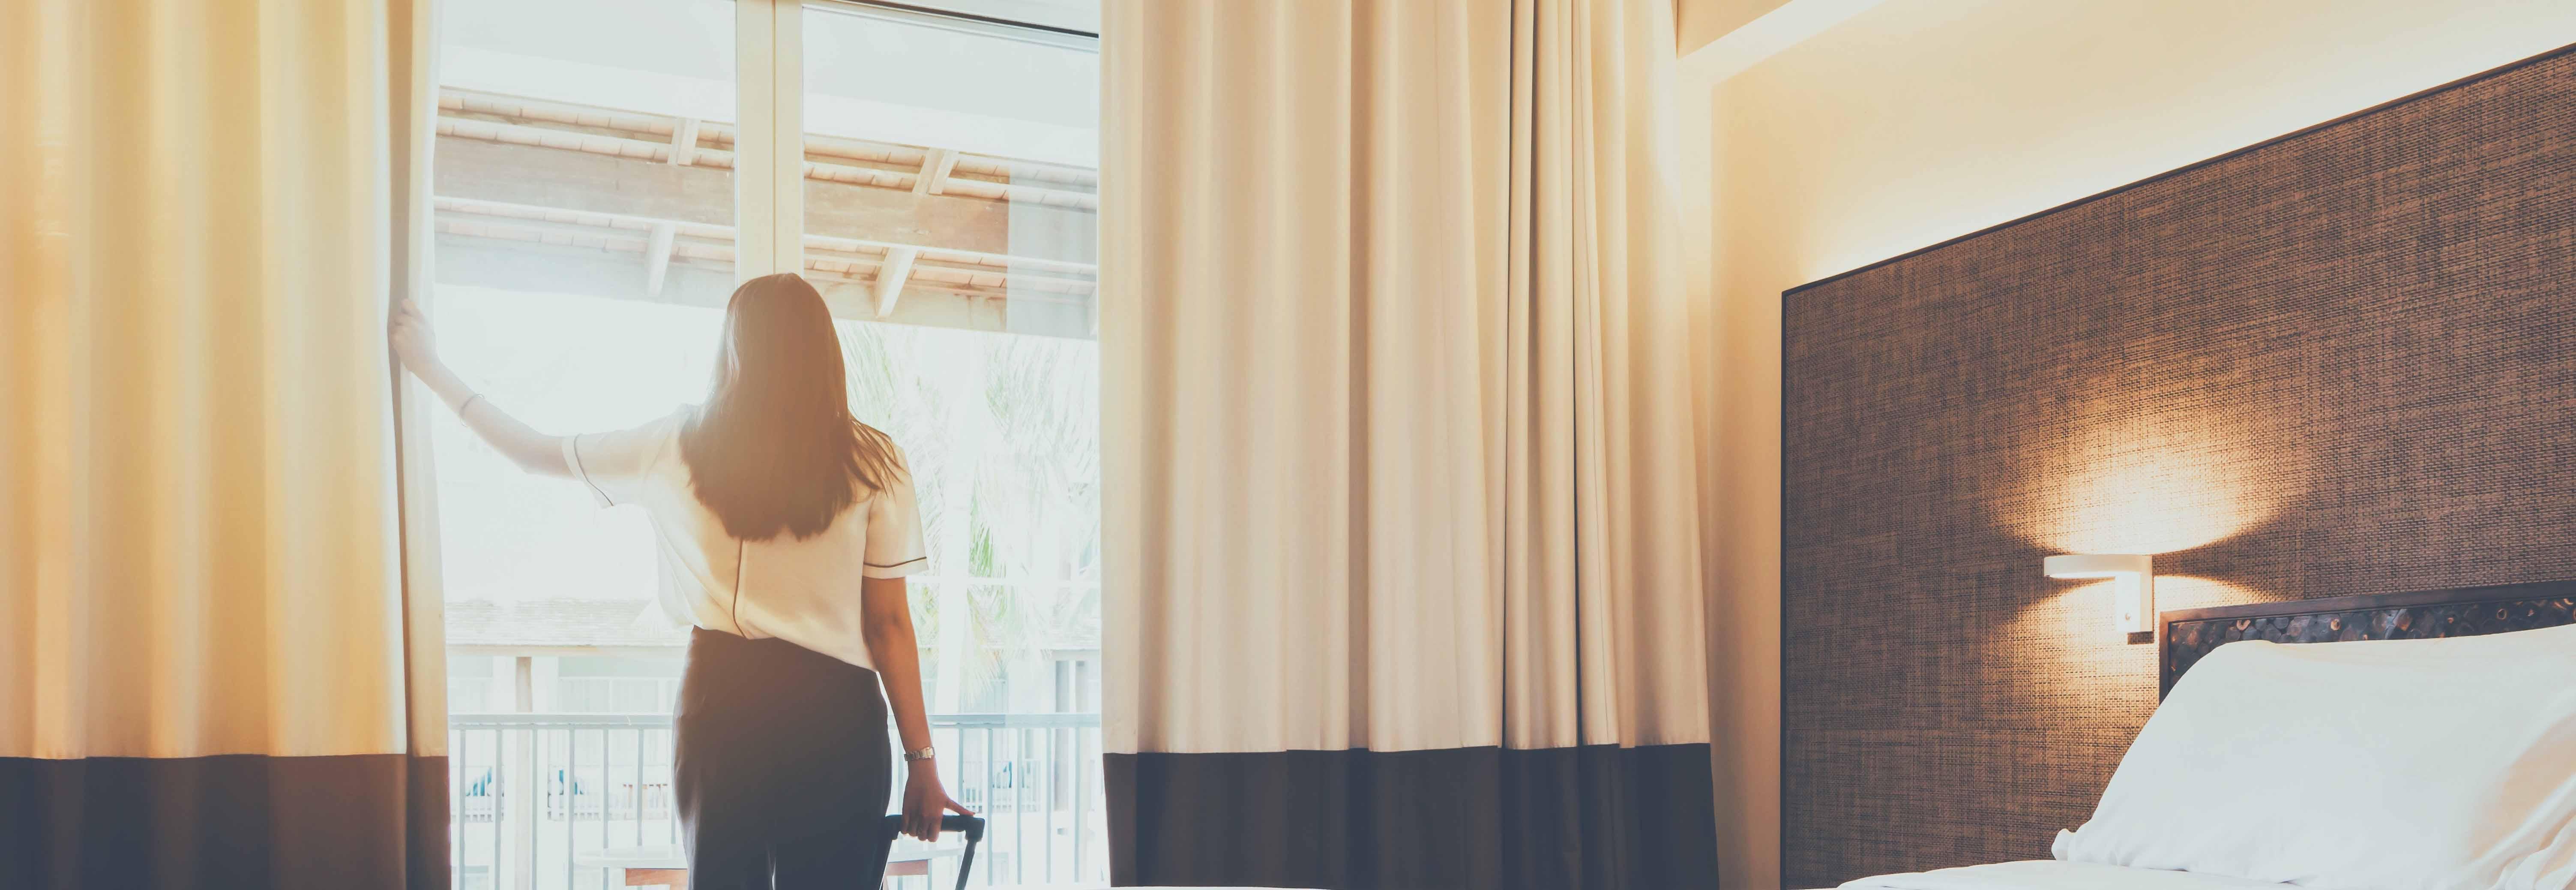 ILC 2020 hotel accommodation information